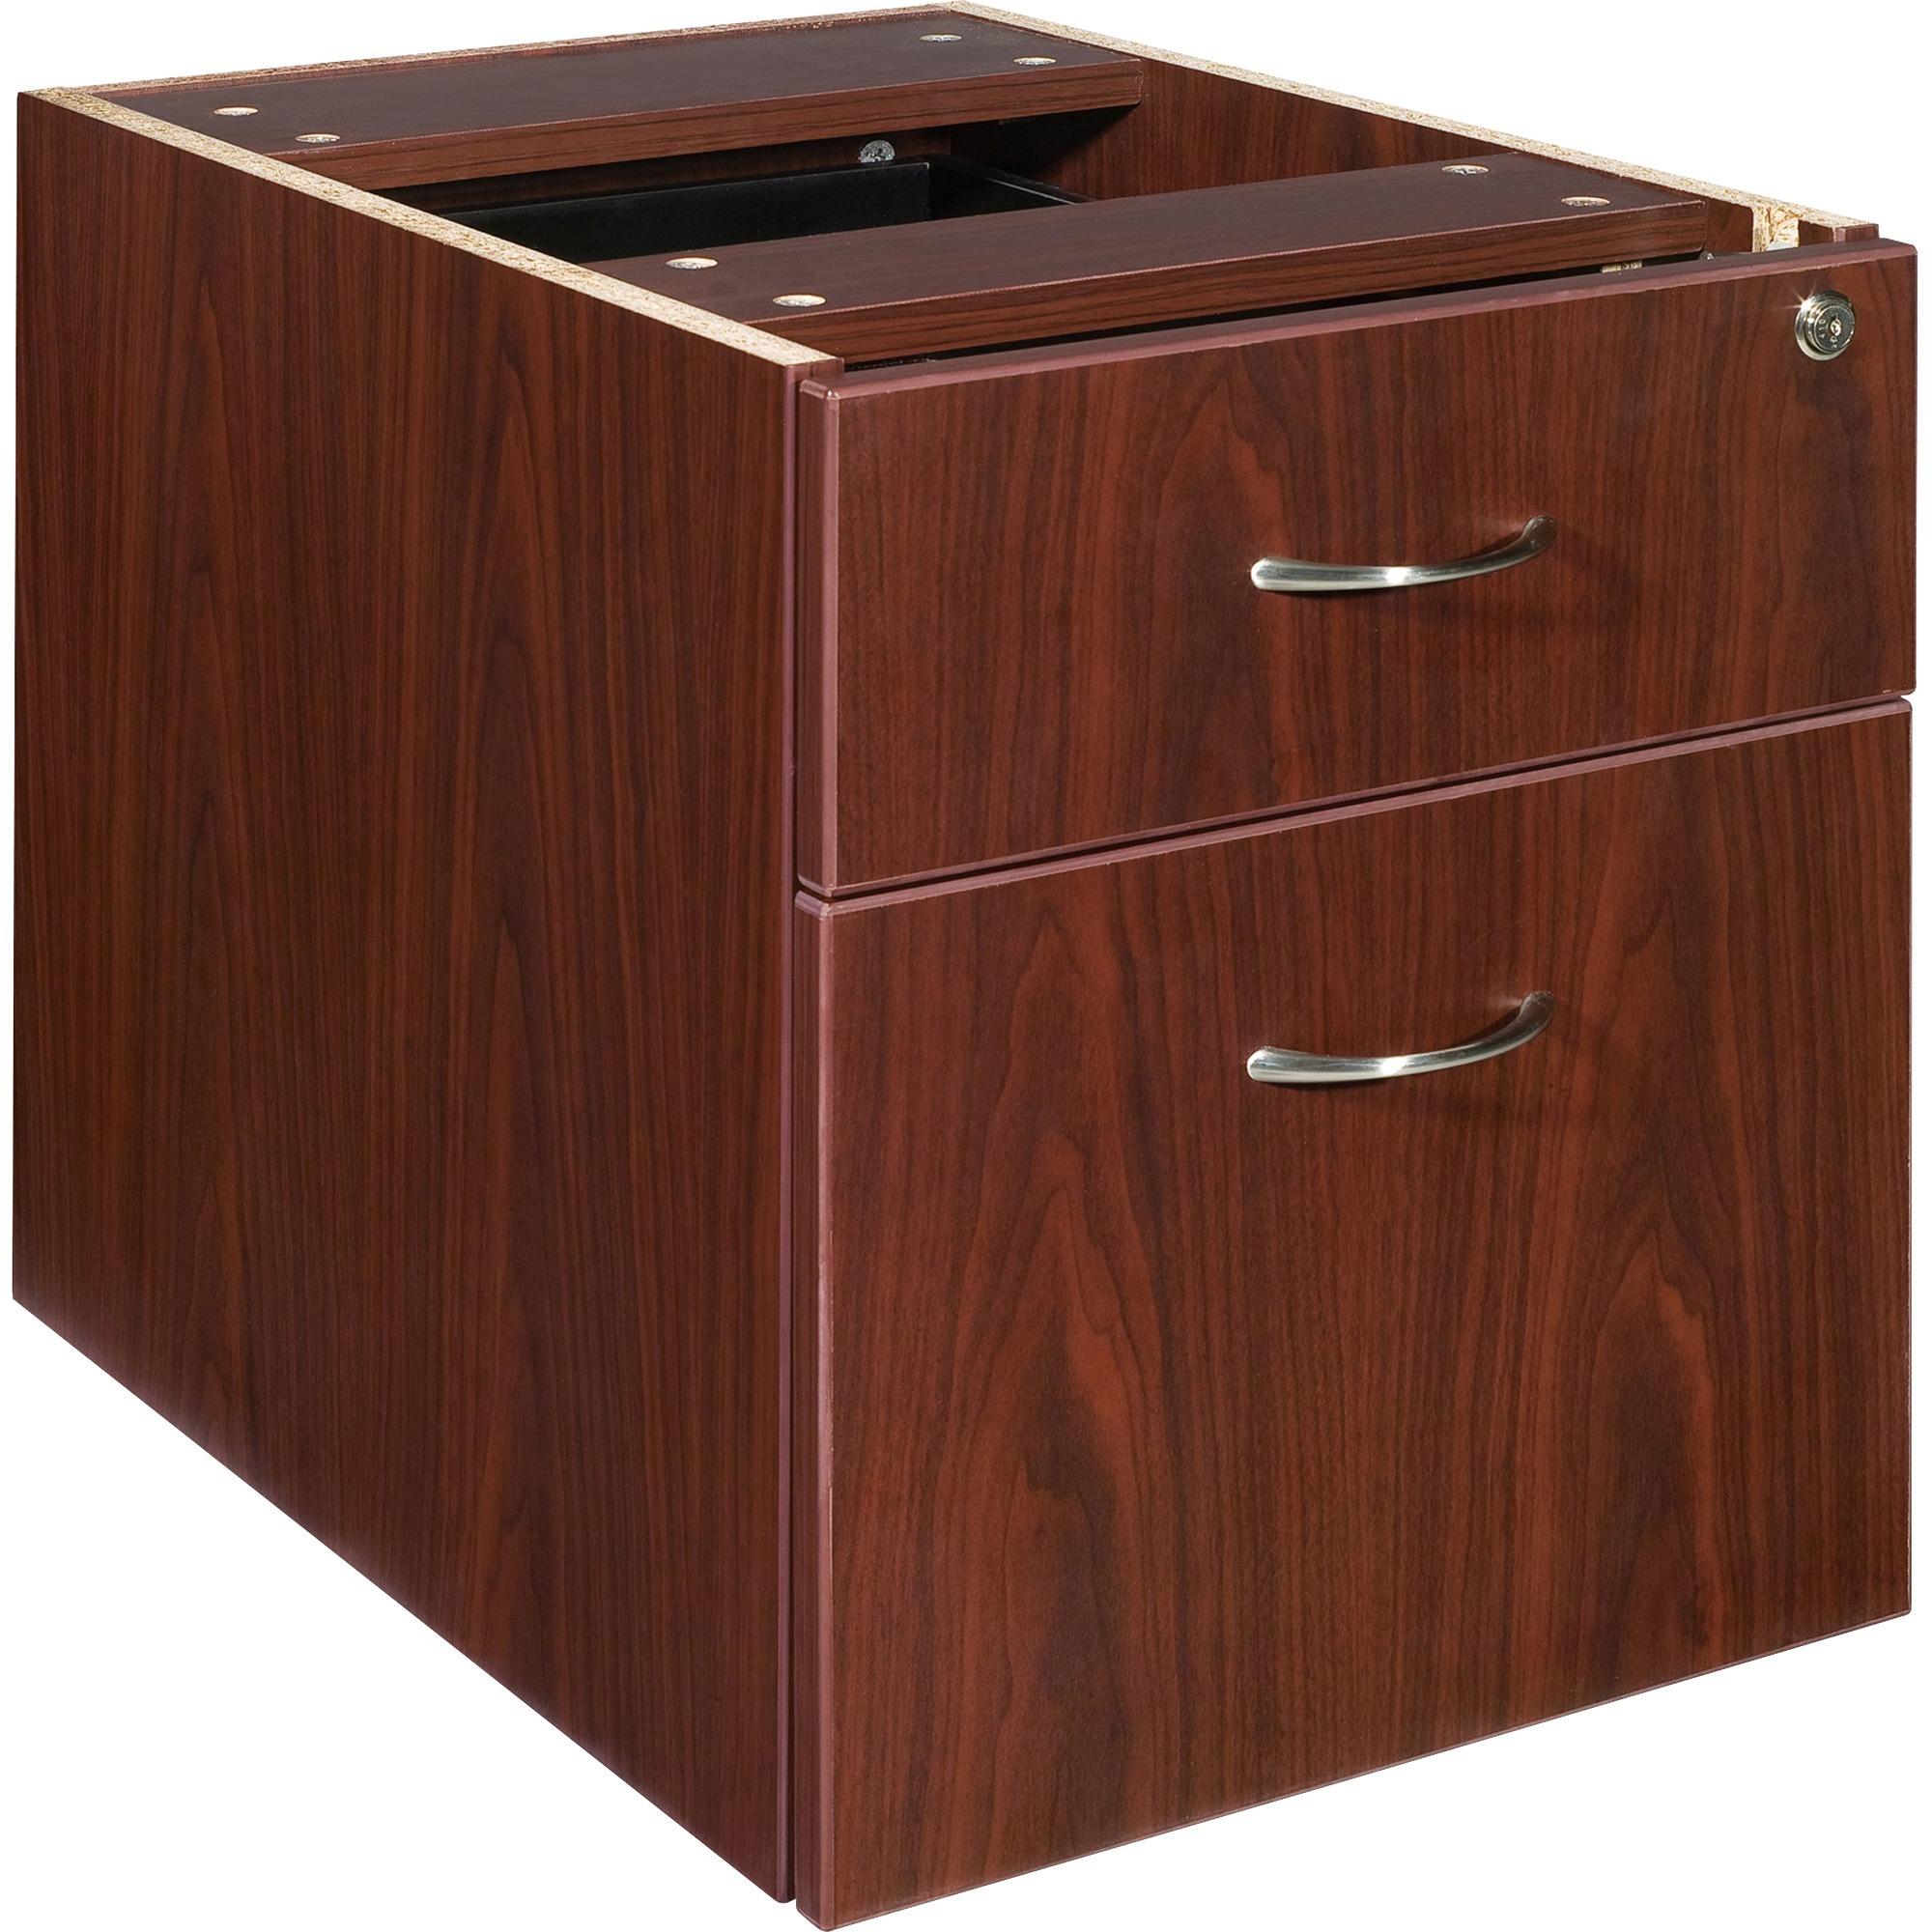 Lorell Essentials Pedestal - 15.5 X 21.9 X 18.9 - 2 X Box Drawer(S), File Drawer(S) - Double Pedestal - Finish: Laminate, Mahogany